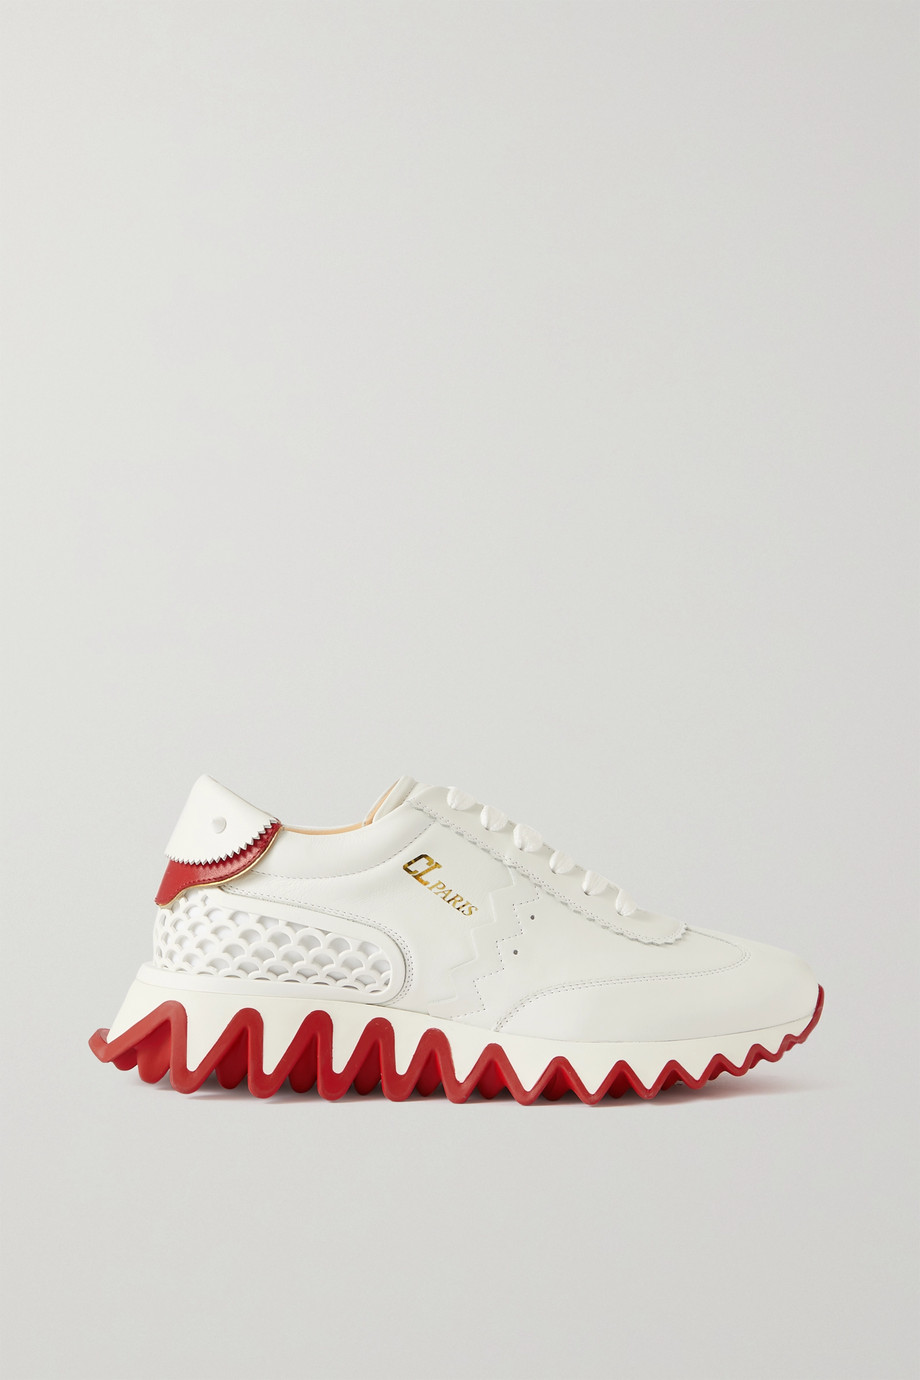 Christian Louboutin Loubi Shark leather and neoprene sneakers